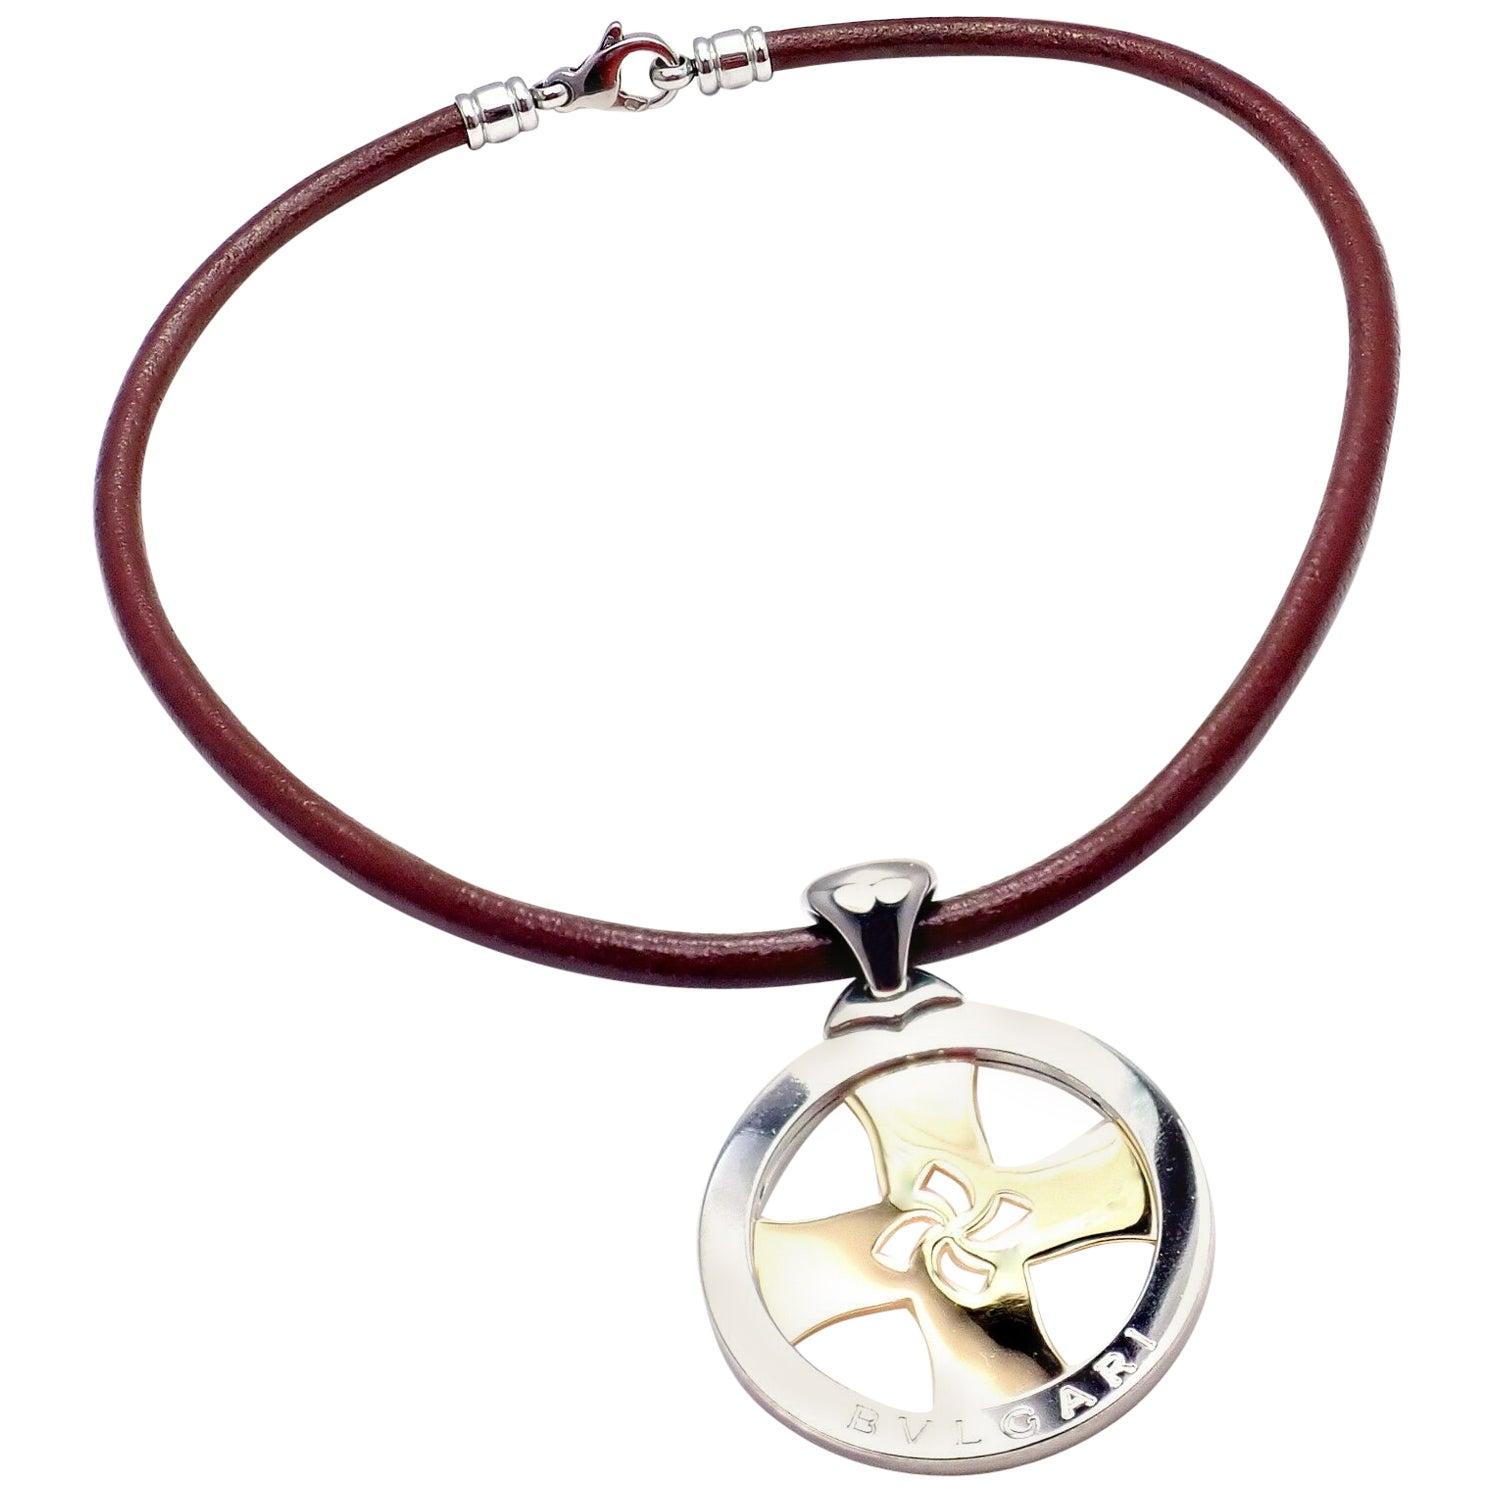 Bulgari Tondo Cross Yellow Gold Stainless Steel Pendant Necklace